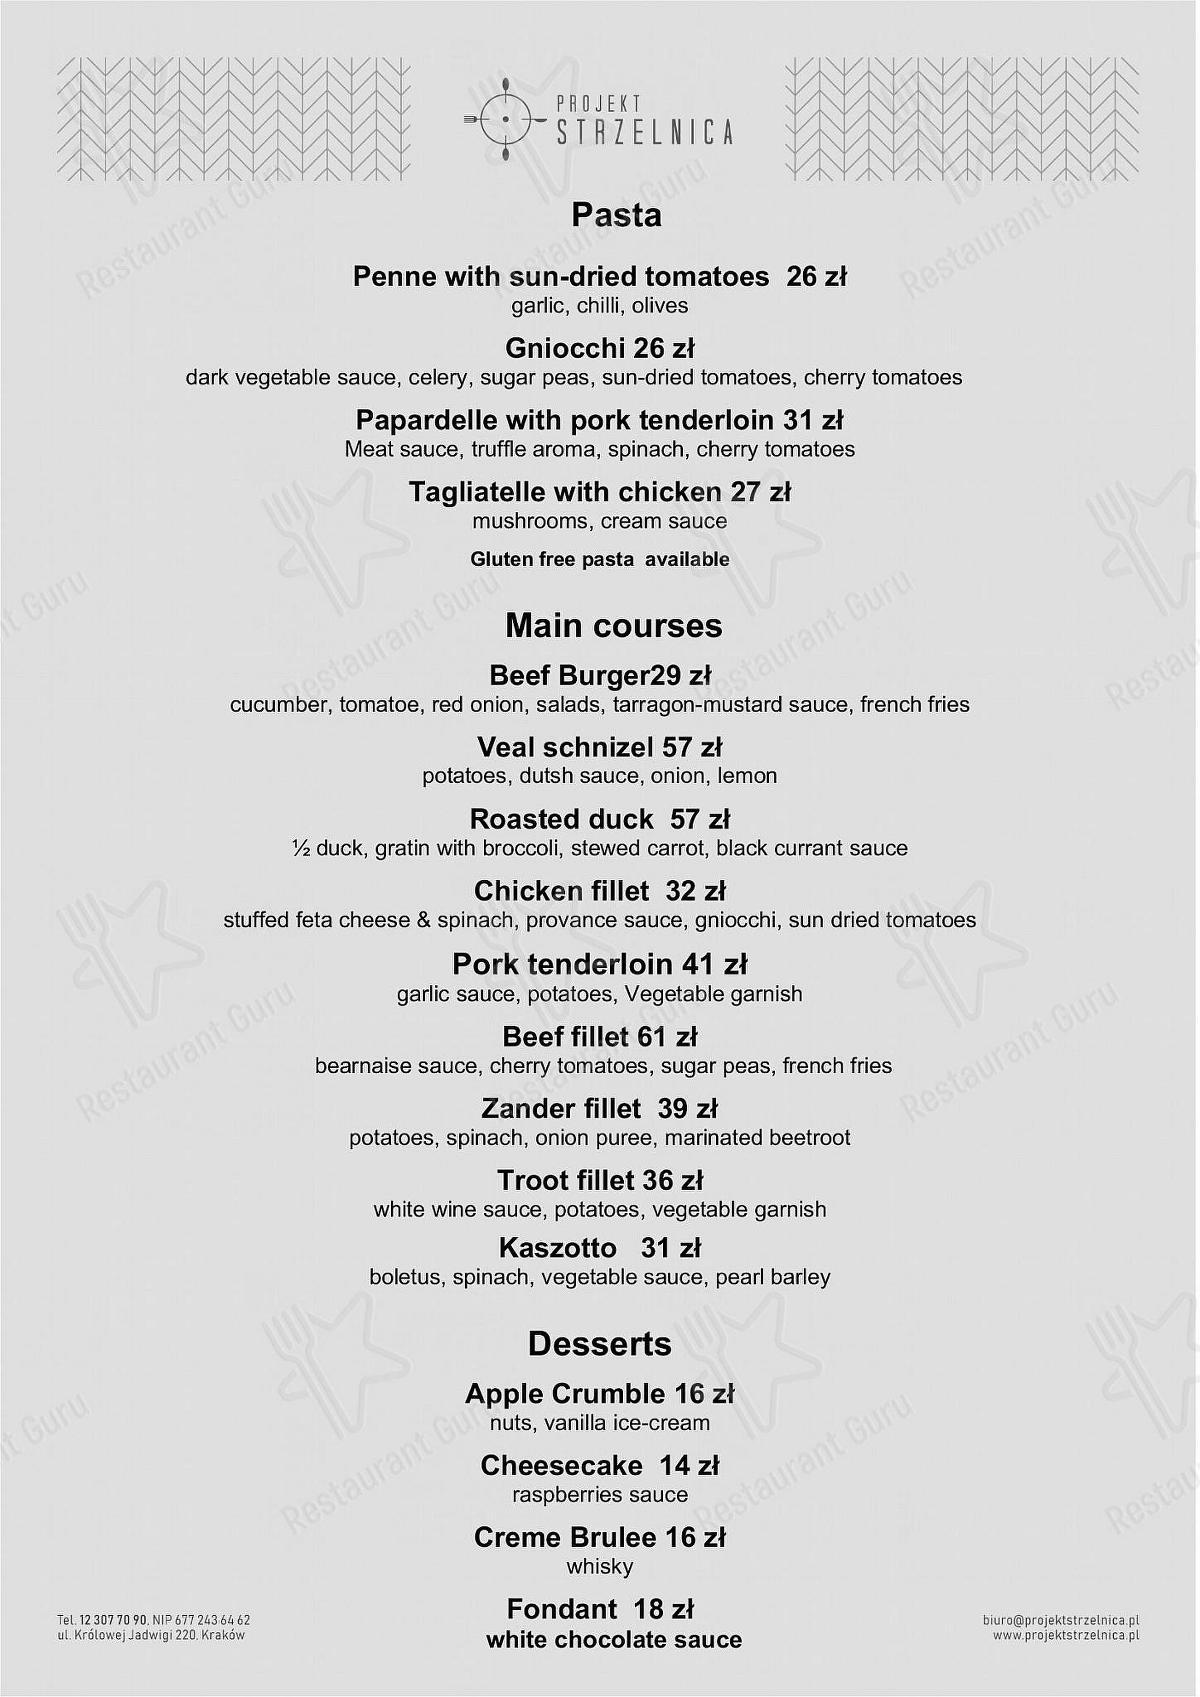 Projekt Strzelnica menu - meals and drinks